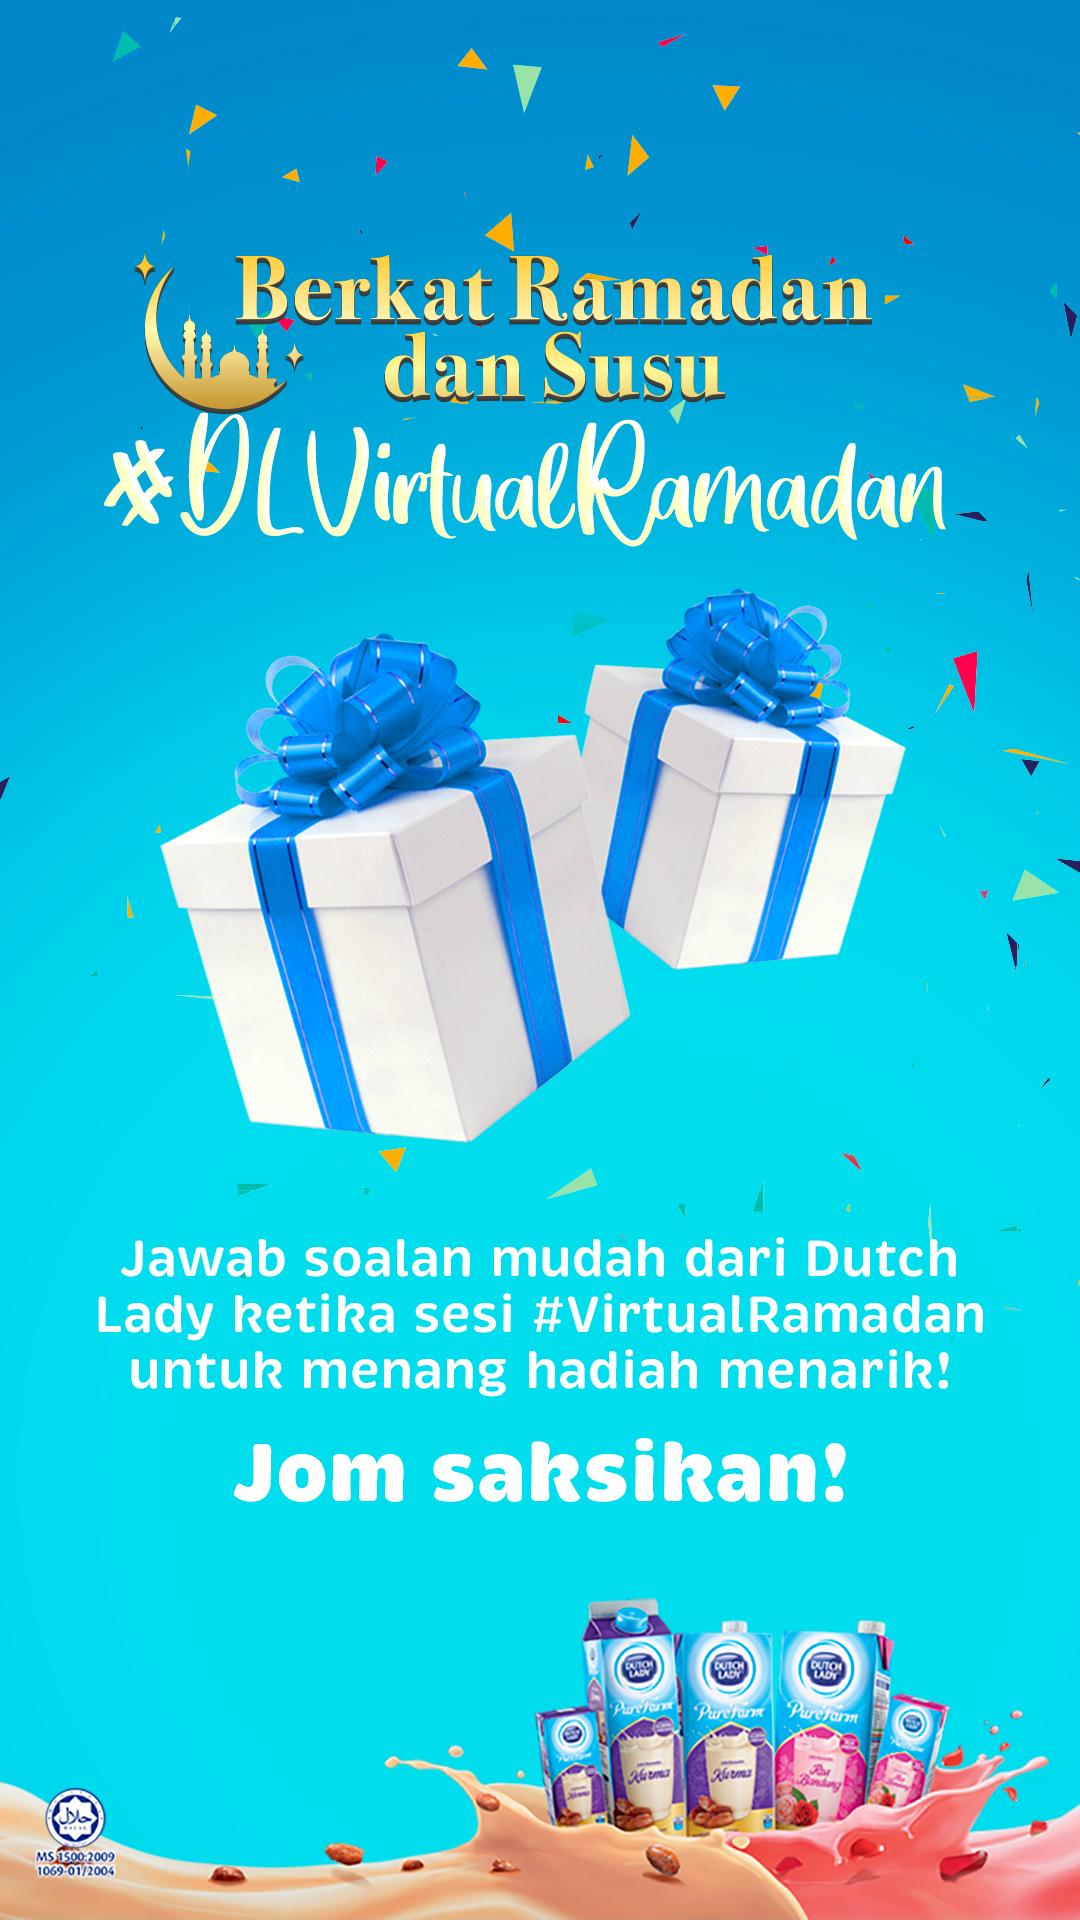 #DLVirtualRamadan_Hadiah